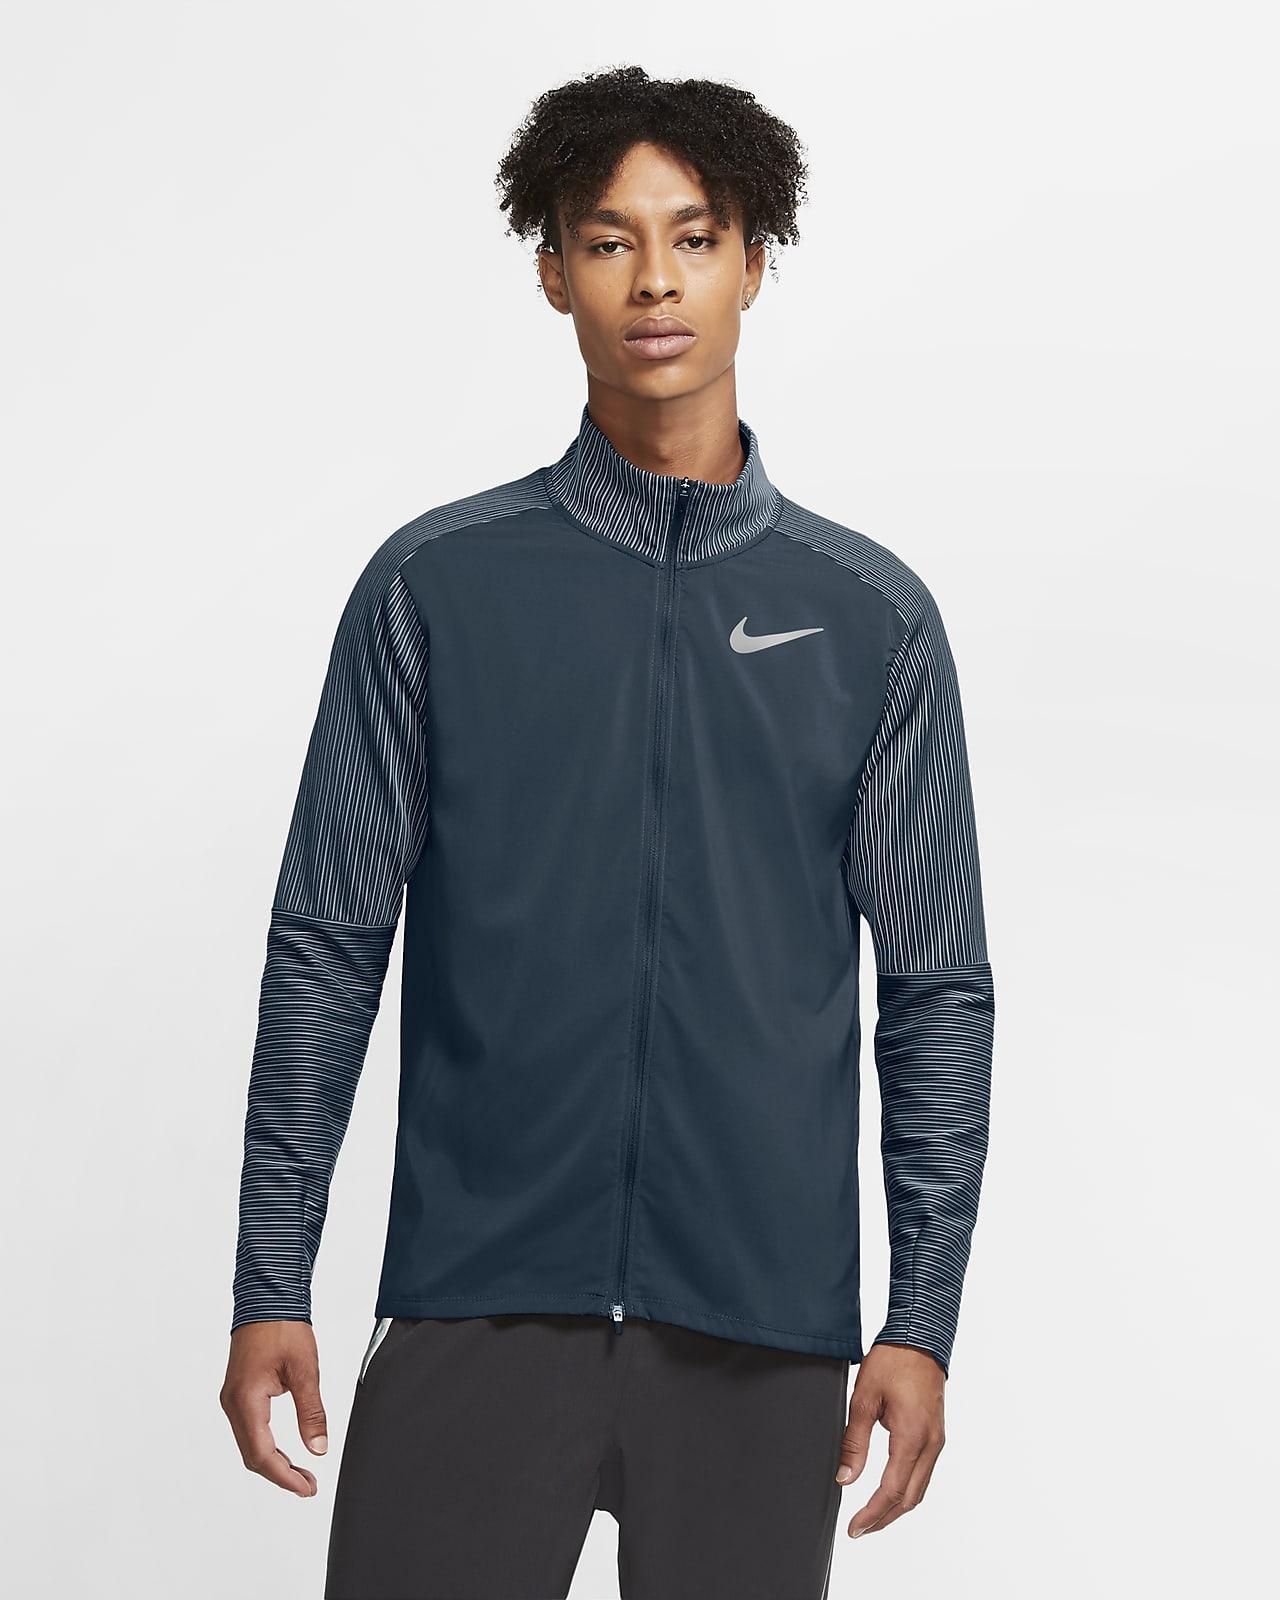 Nike Future Fast Men's Hybrid Running Top